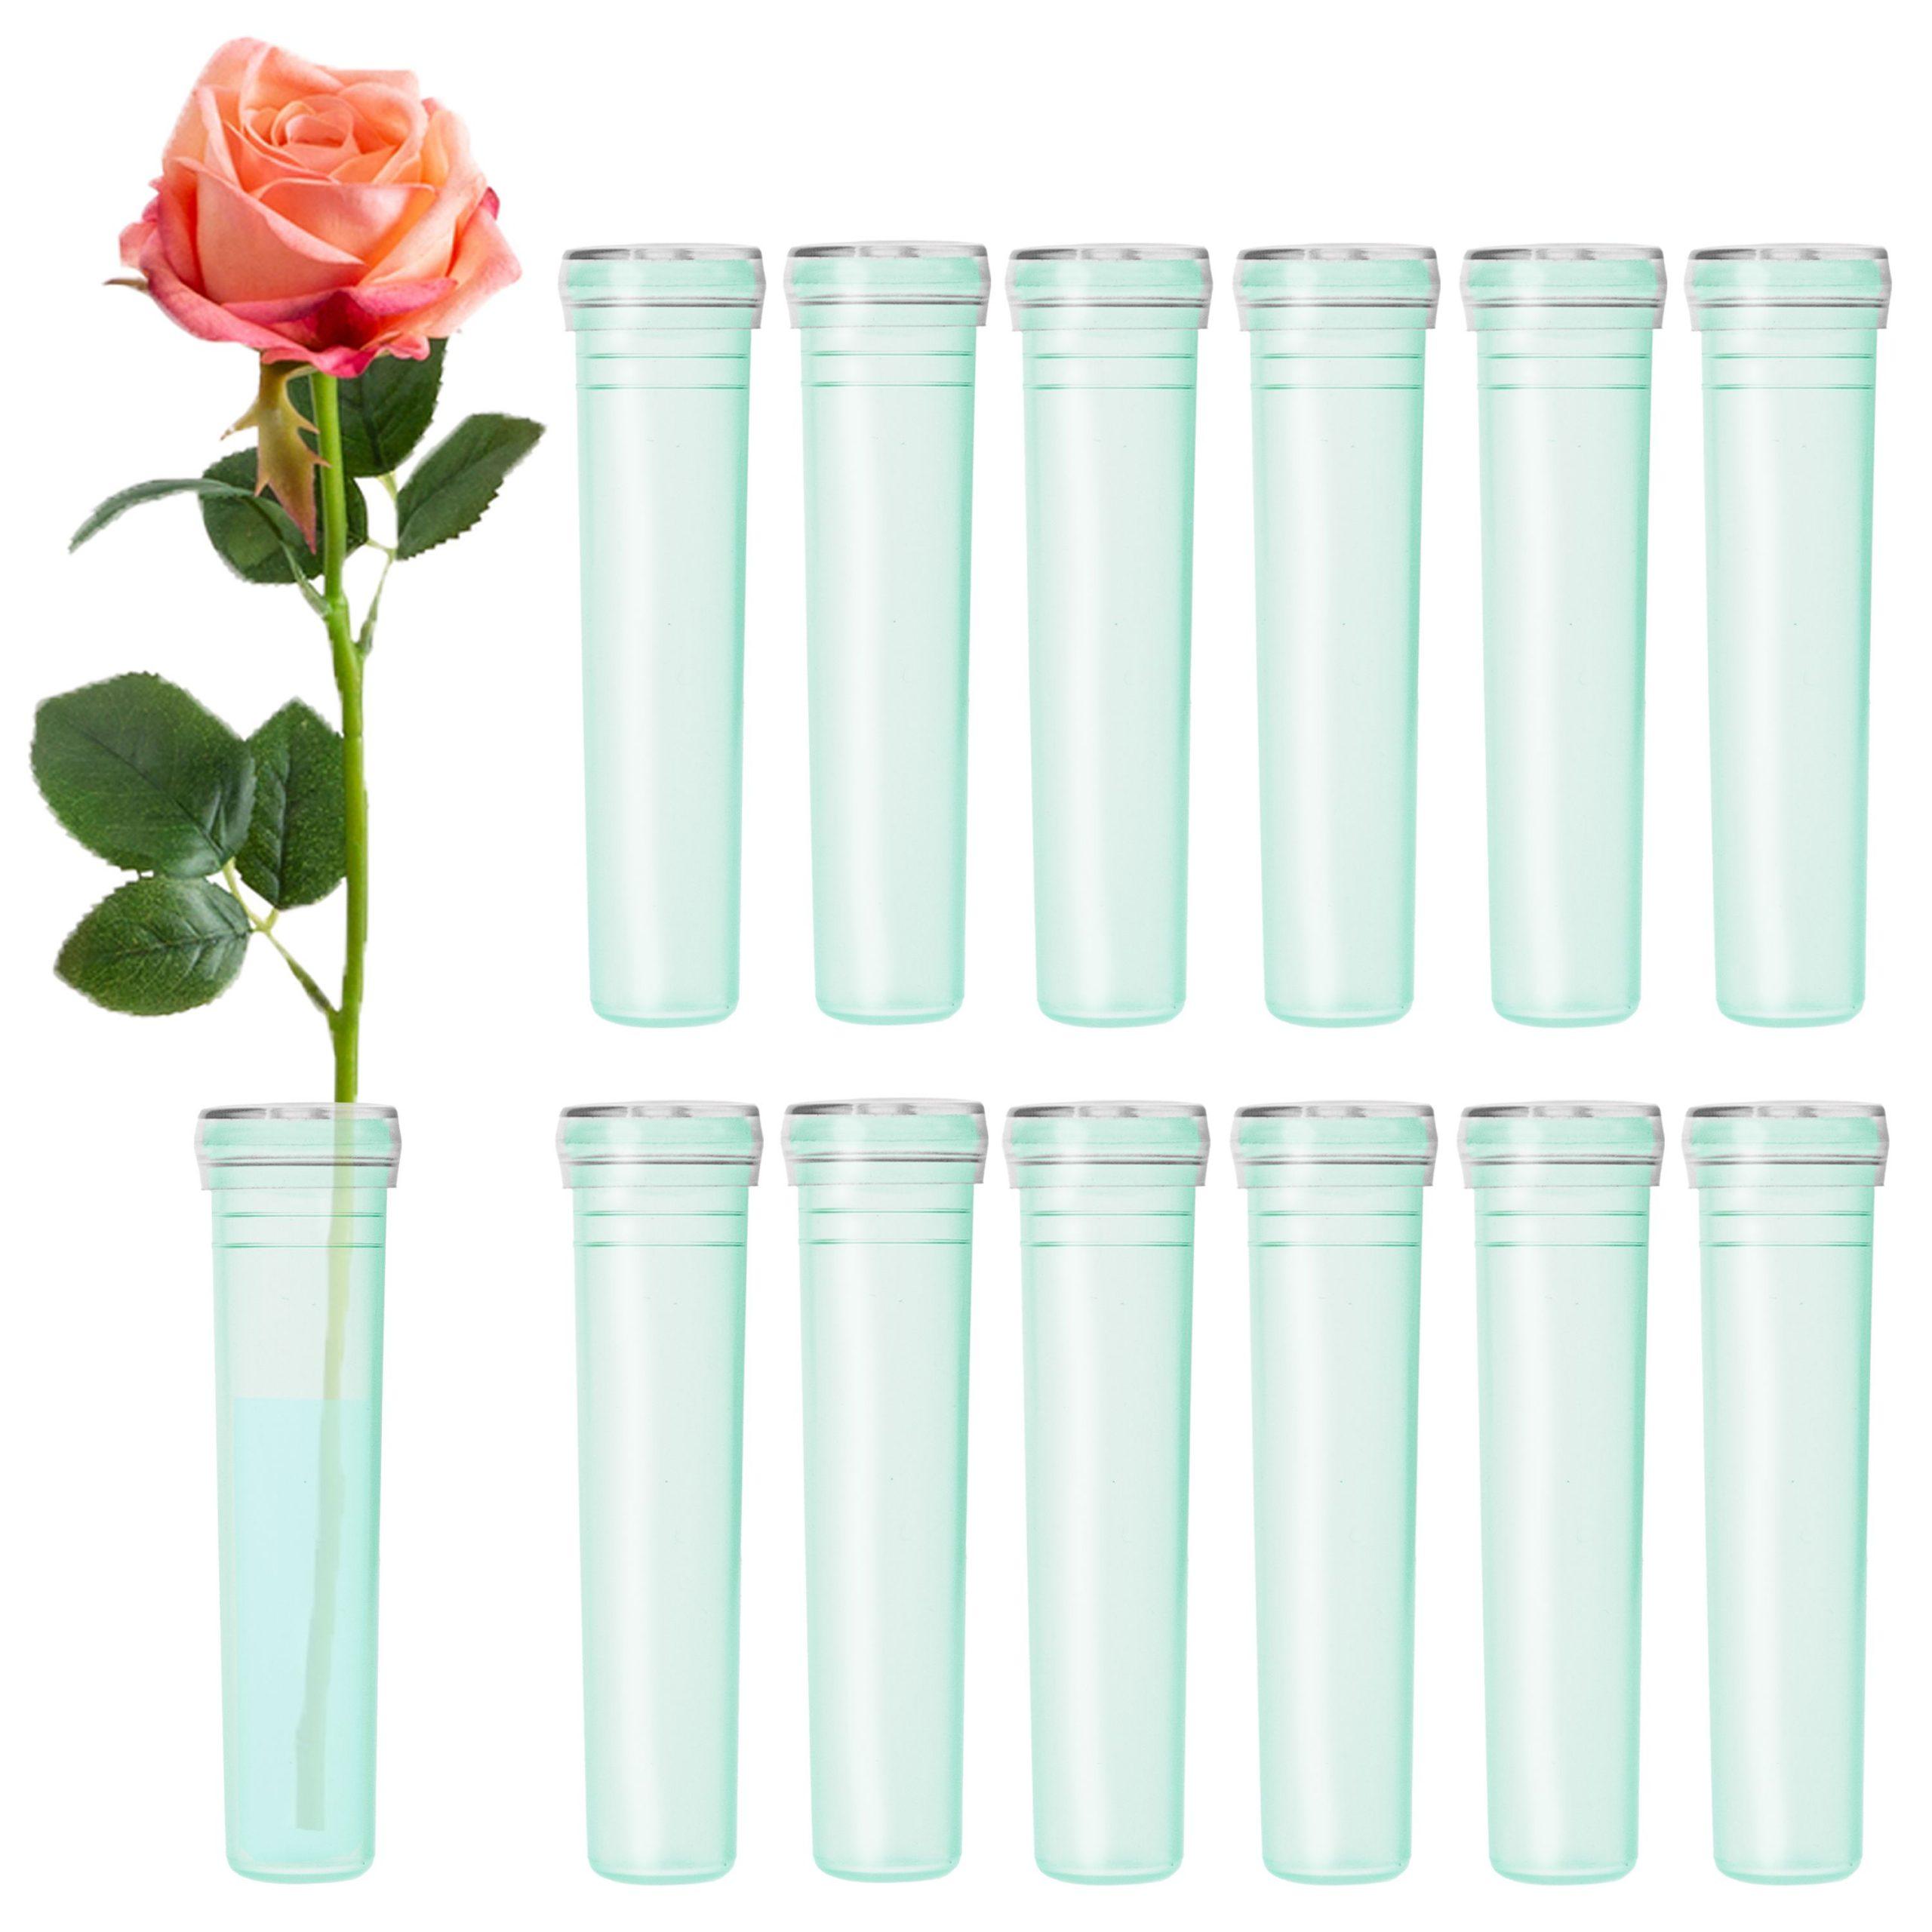 Floral-Water-Tubes-Green-Flower-Vials-7cm-20pcs